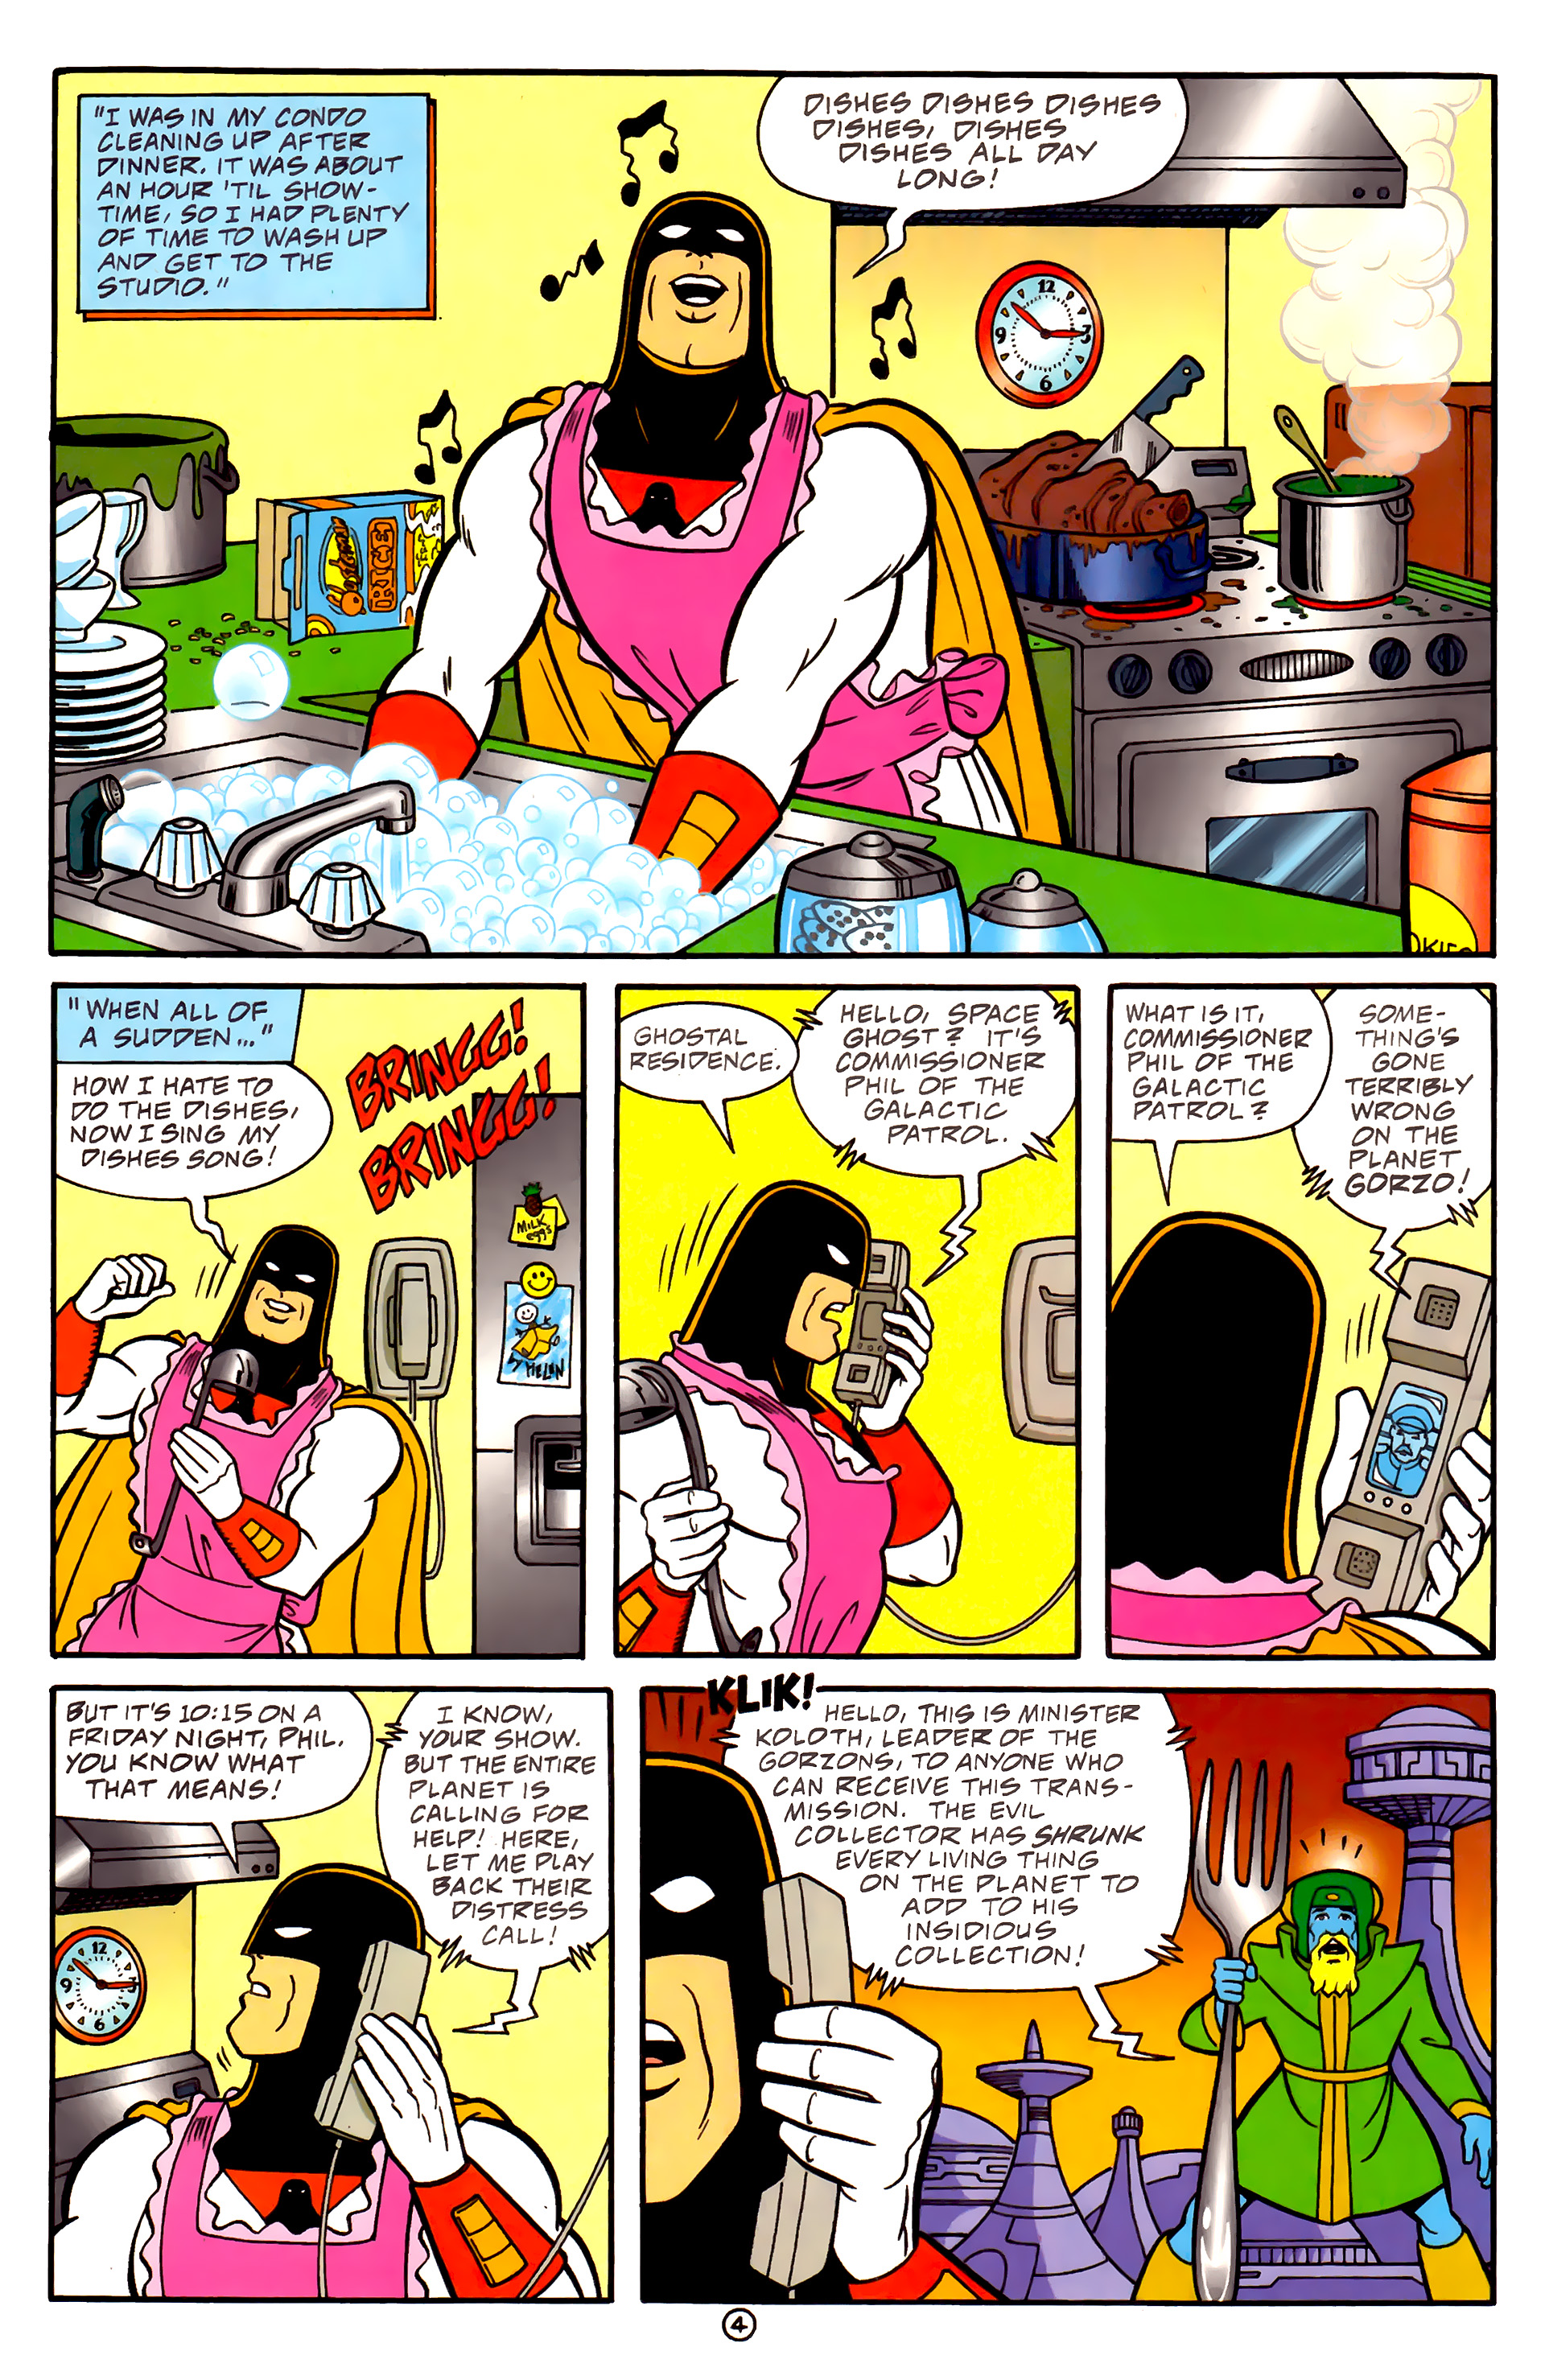 Cartoon Network Starring Issue 4 | Viewcomic reading comics